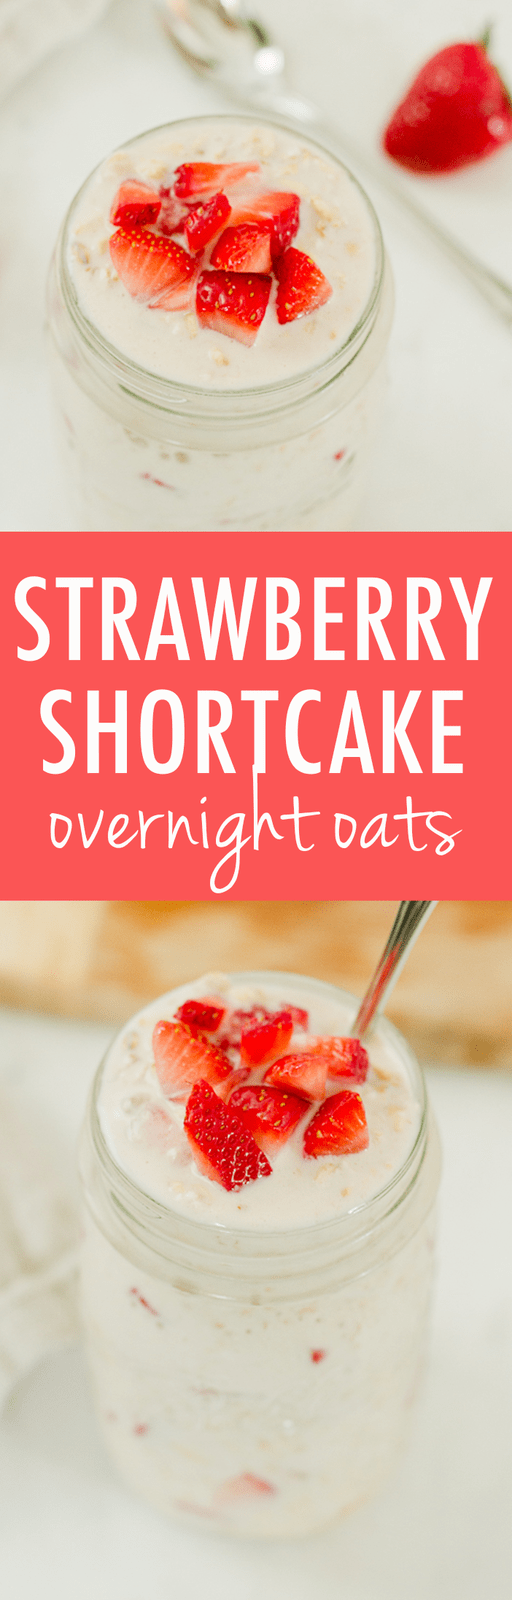 Strawberry Shortcake Oatmeal Recipe